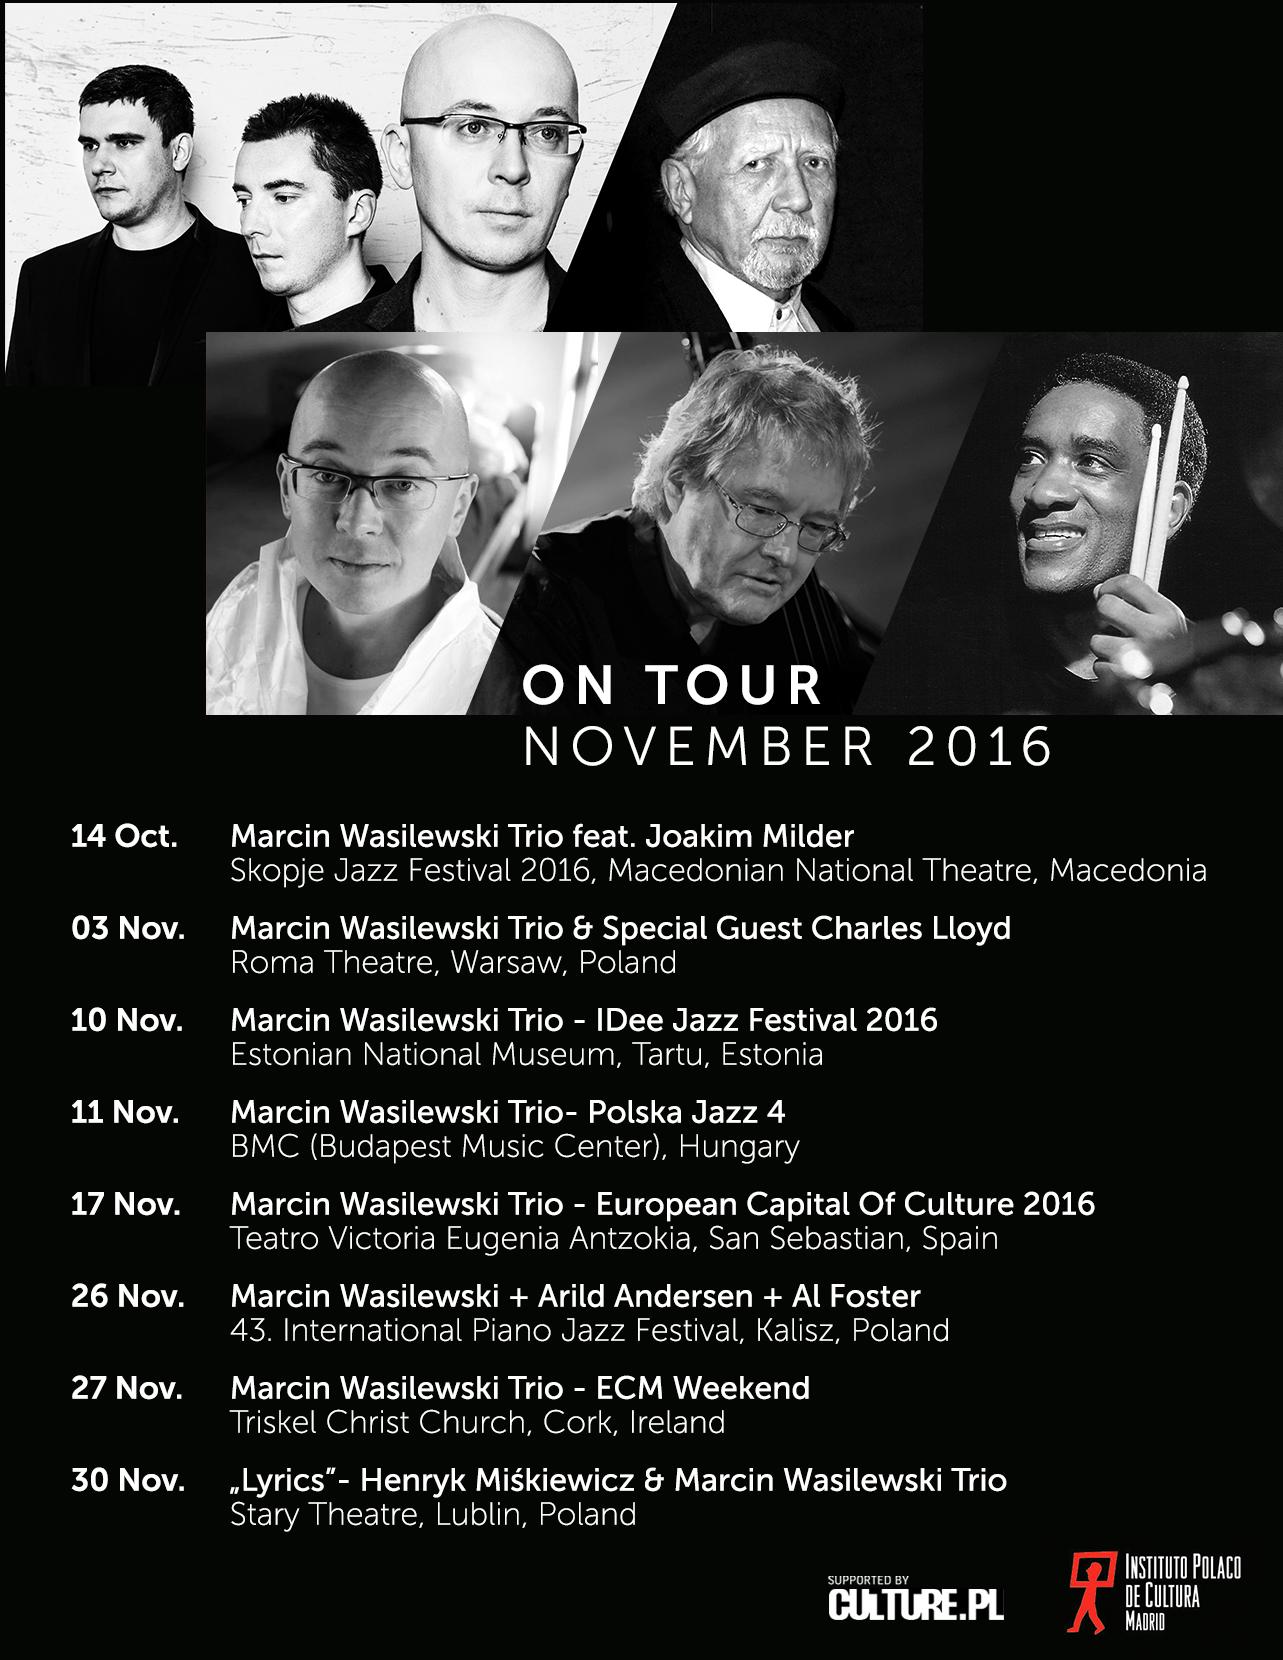 MWT_fb_eu_tour_2016.jpg